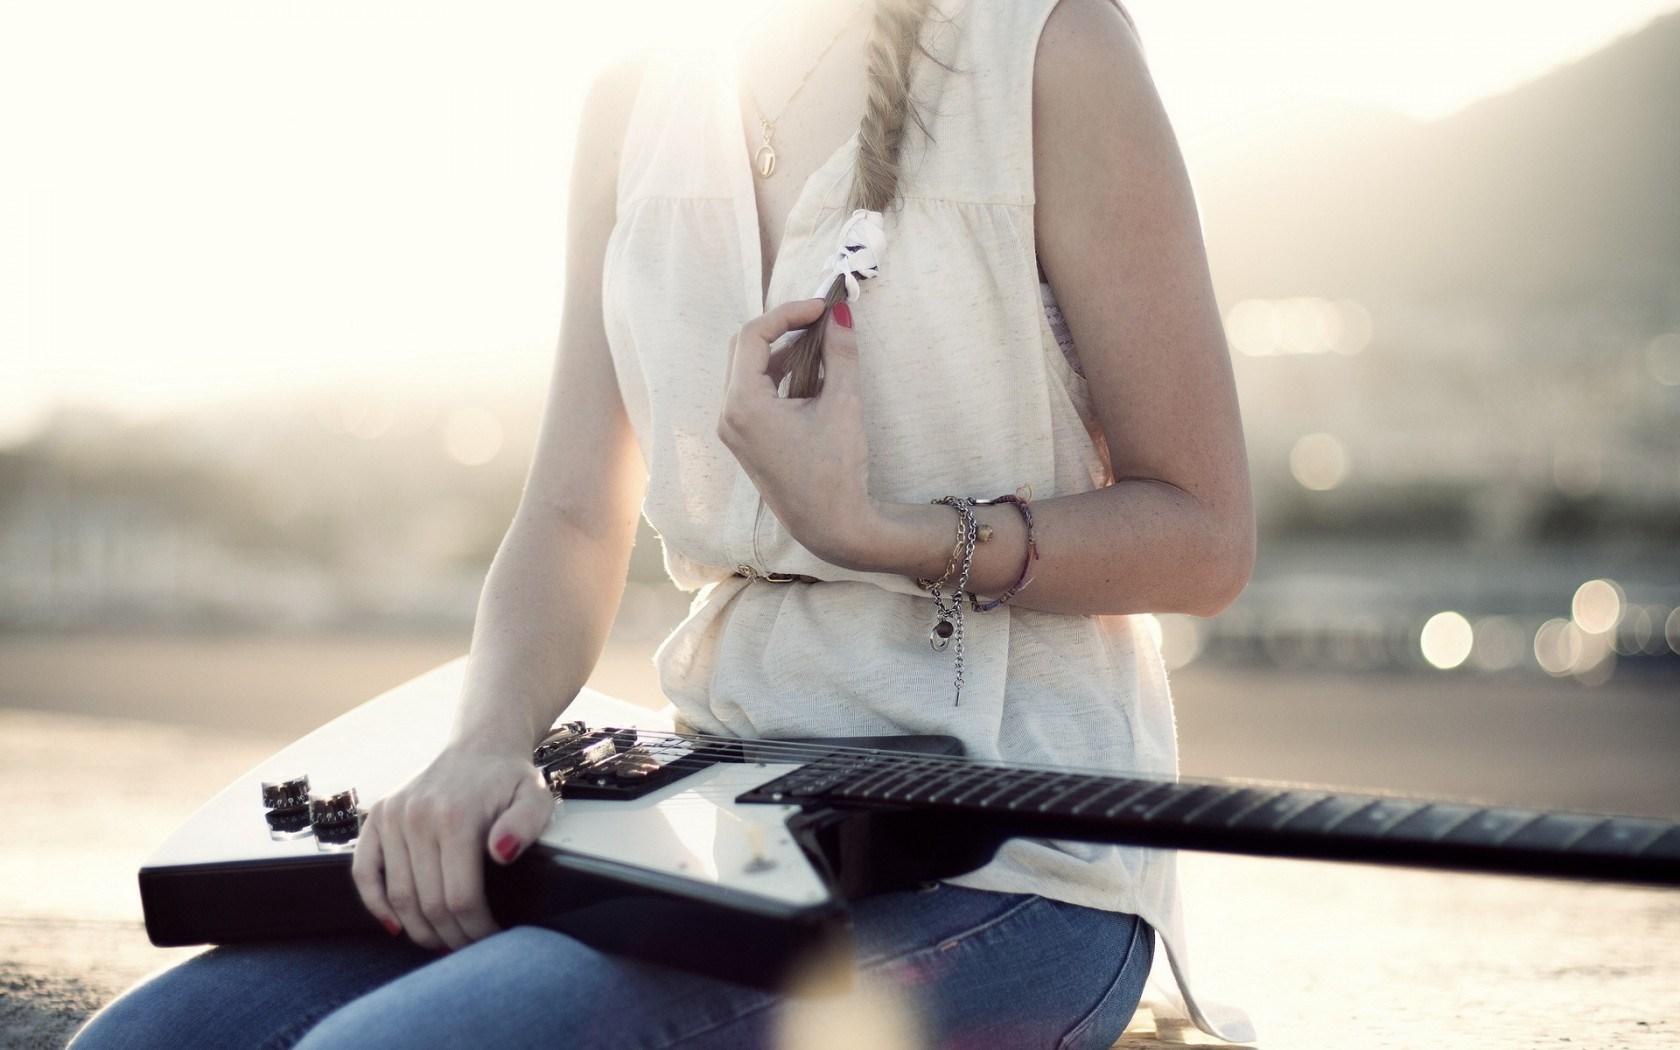 music country vintage guitar girl singer sunset hd wallpaper